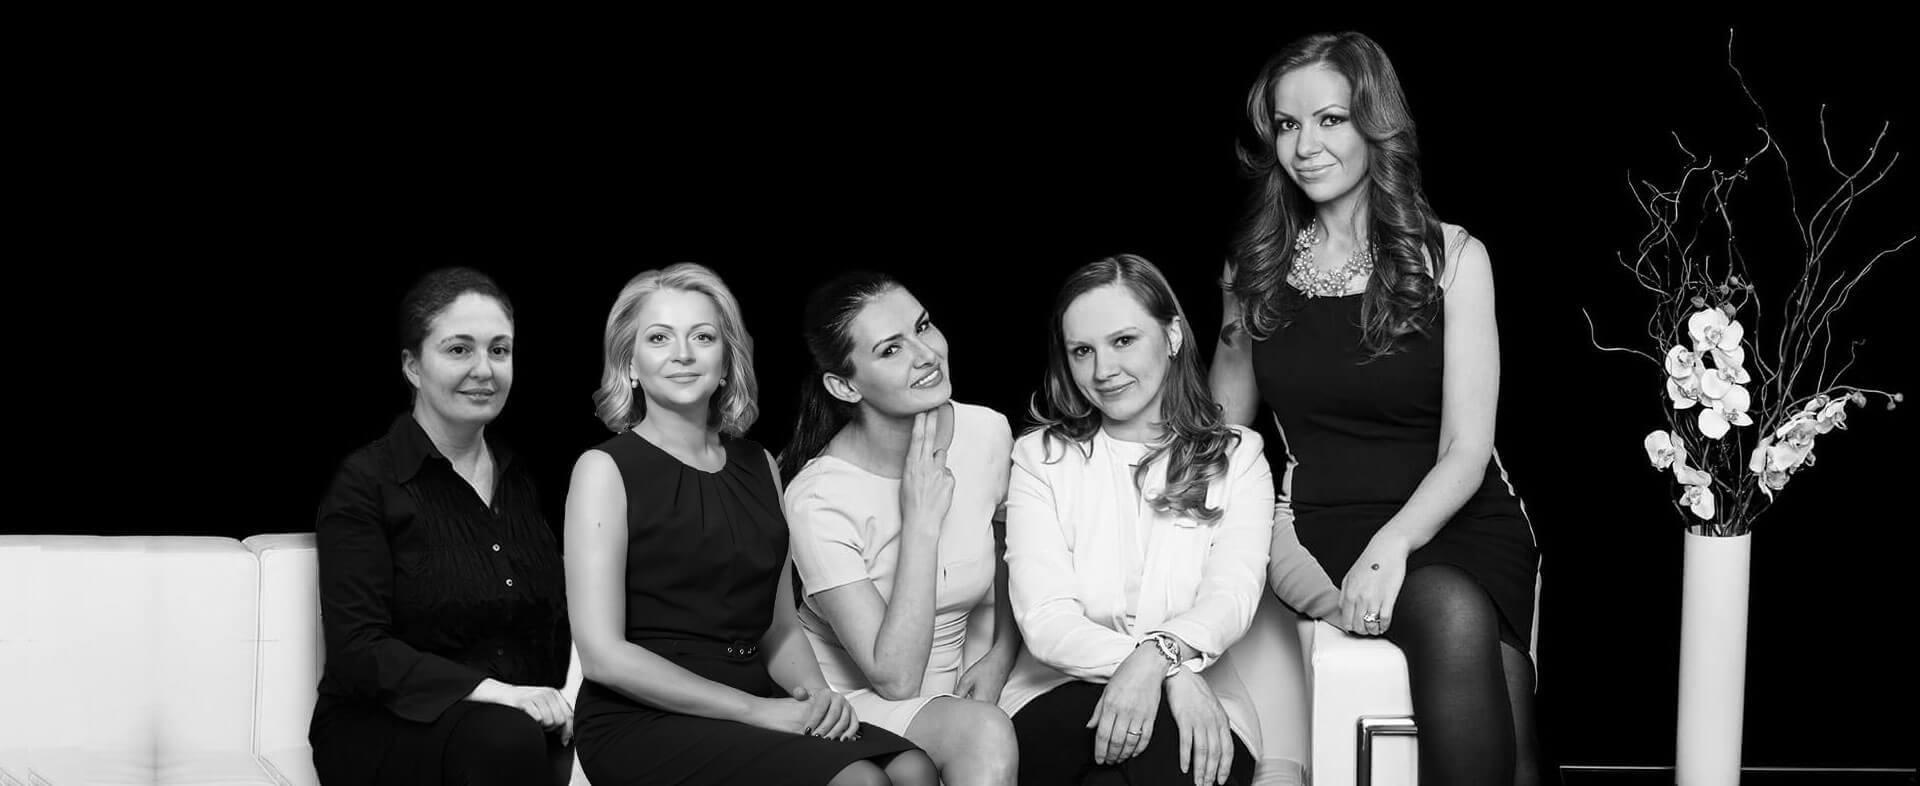 Khrome Dermatology team